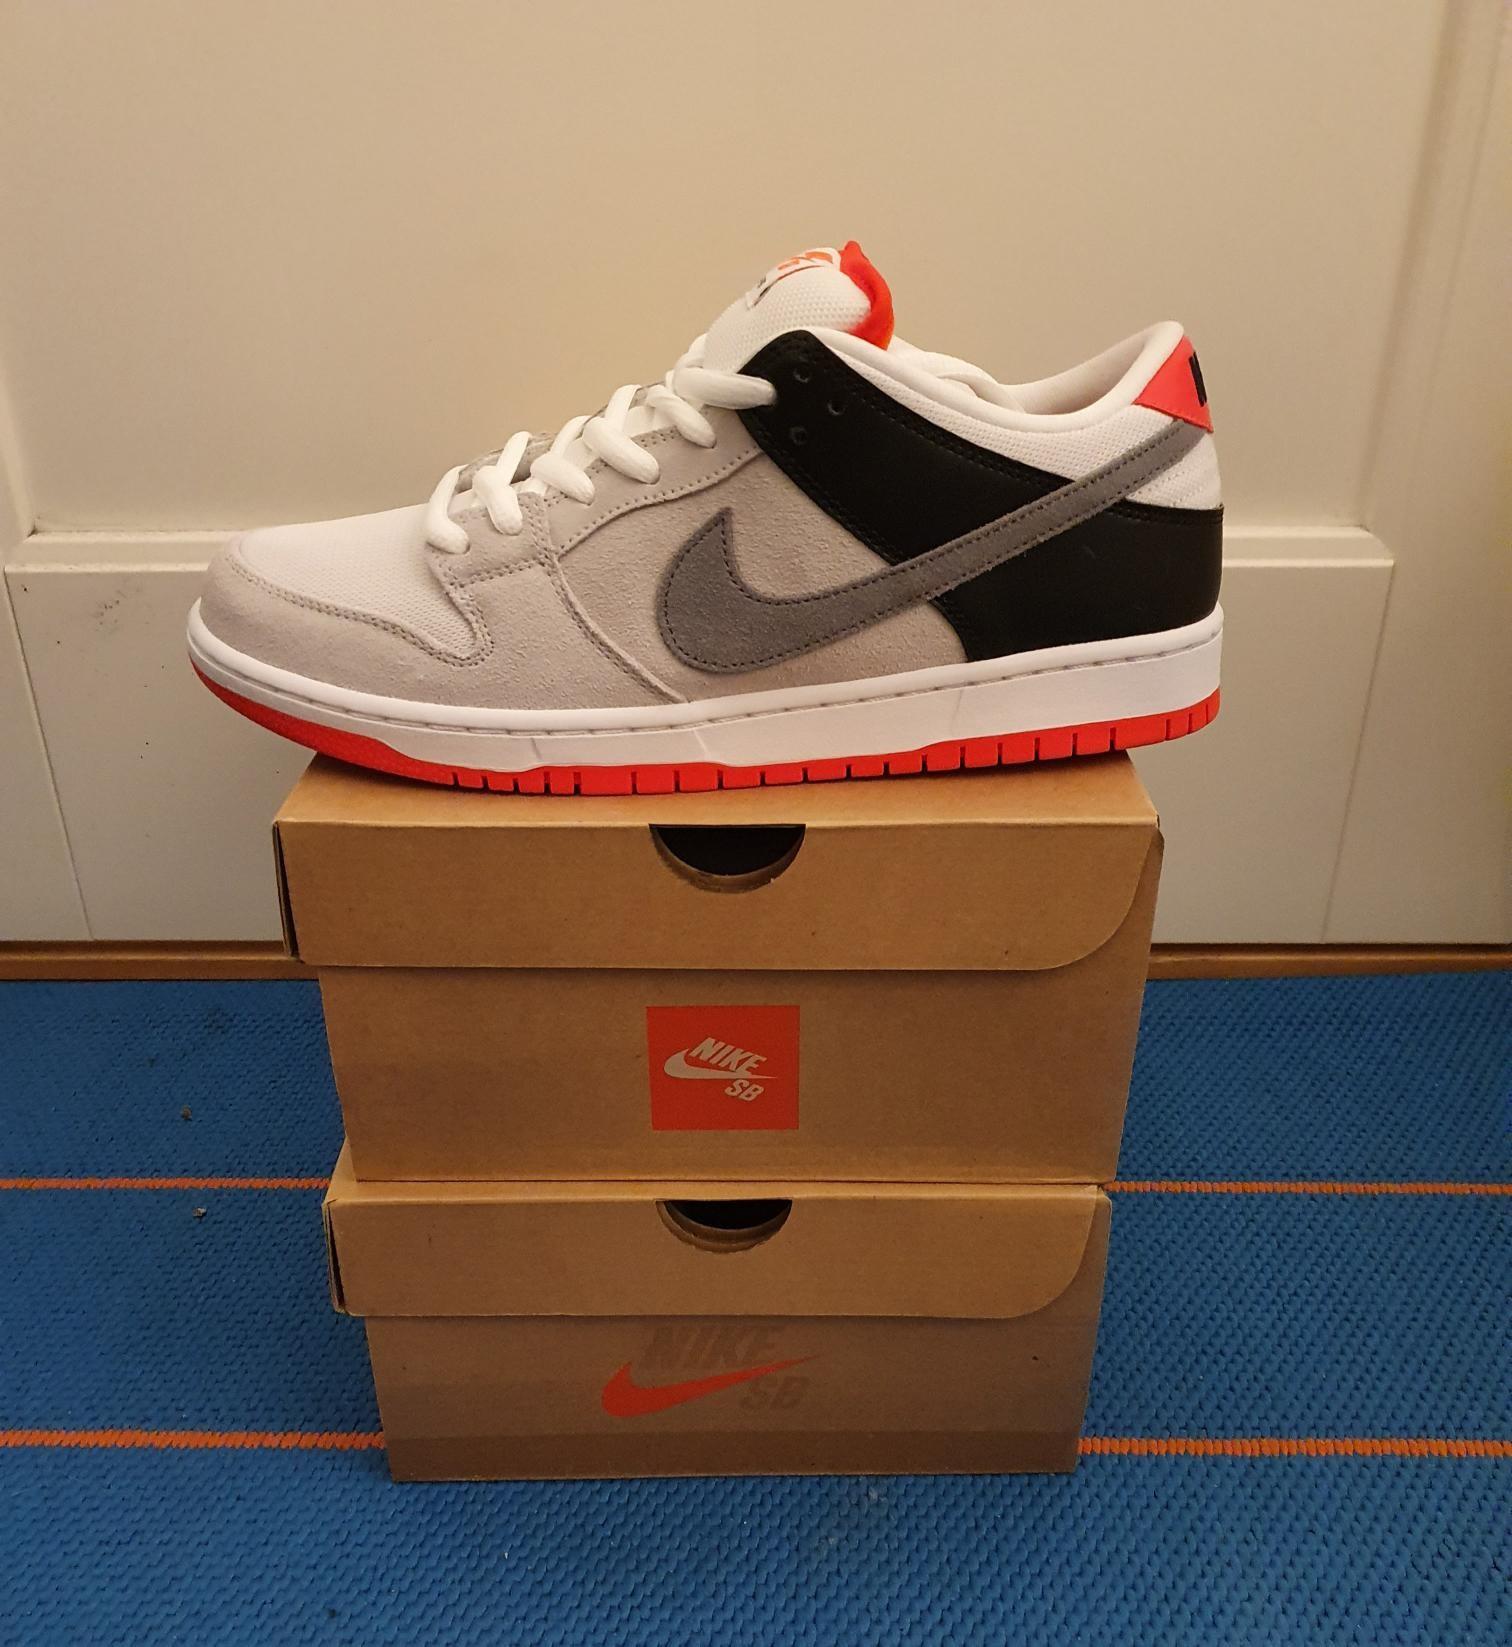 Nike SB Dunk Infrared 44   FINN.no